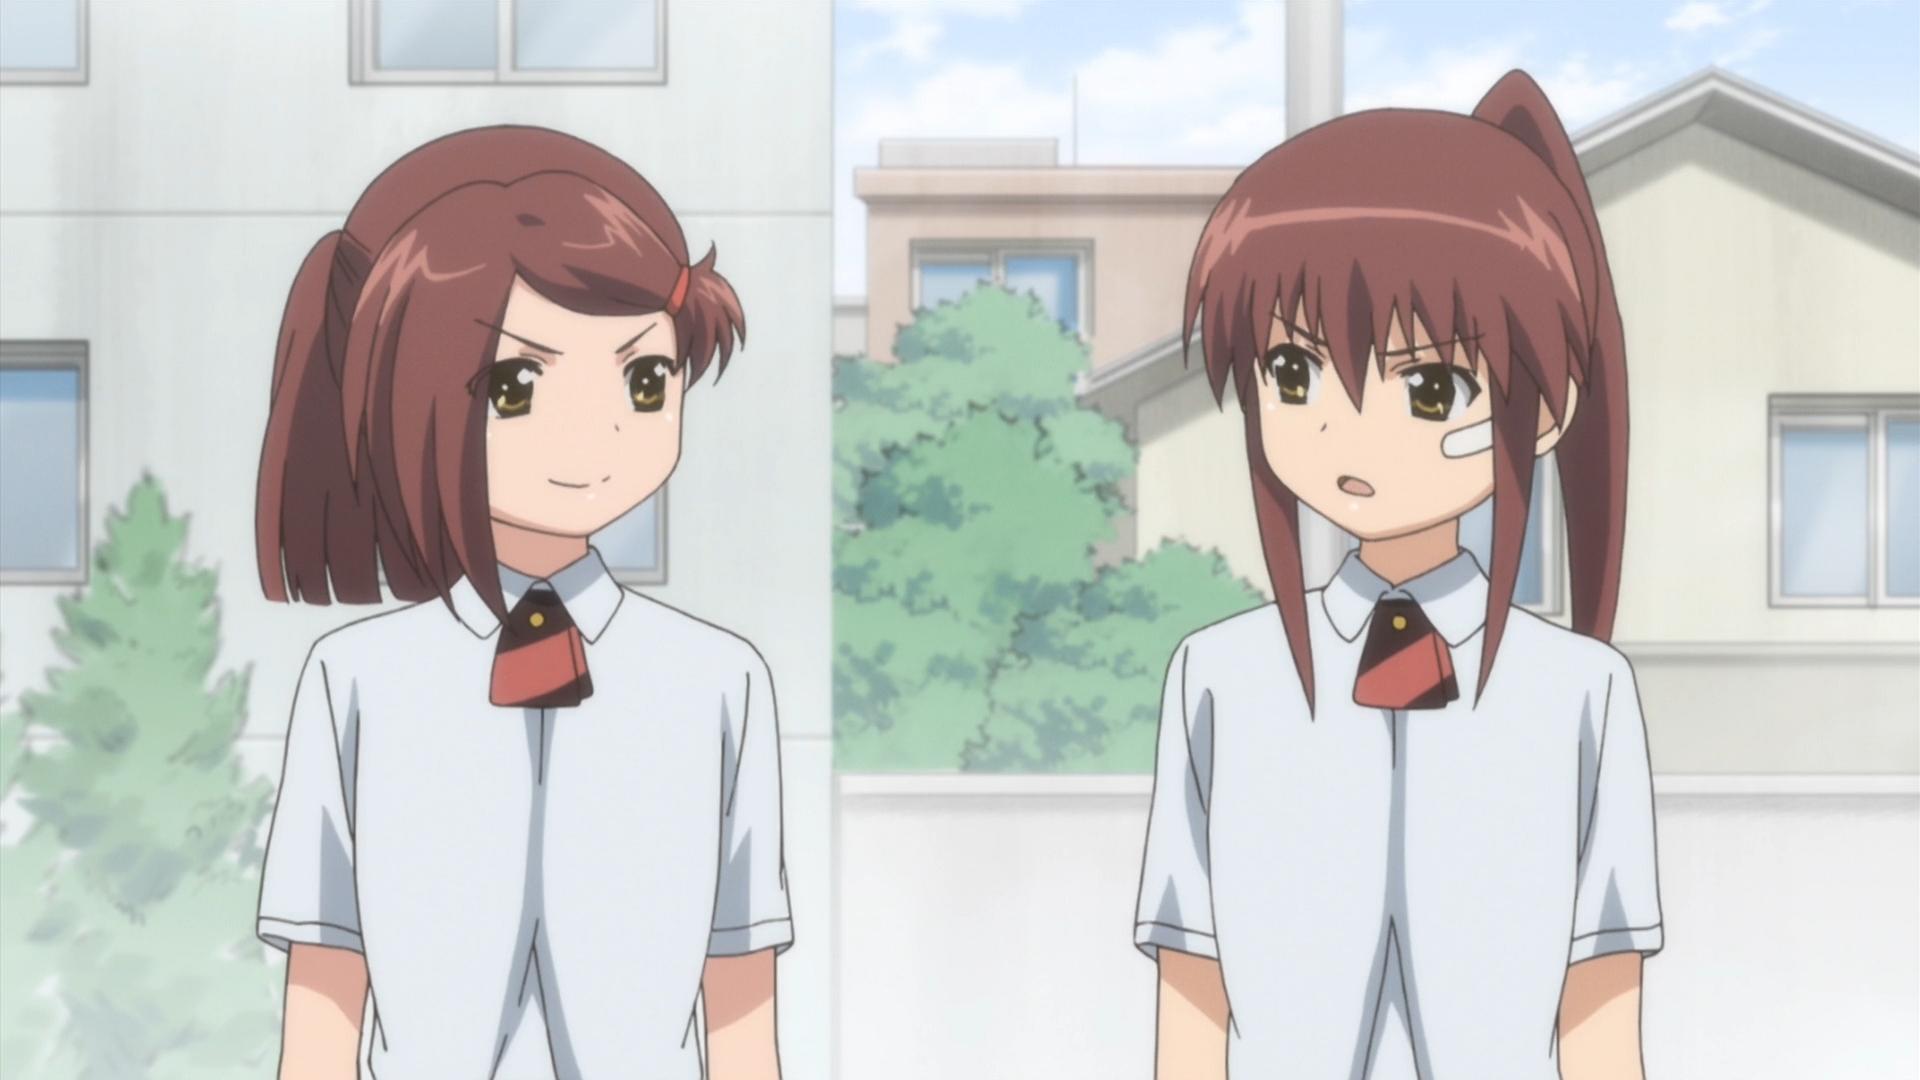 Actual japanese school uniforms